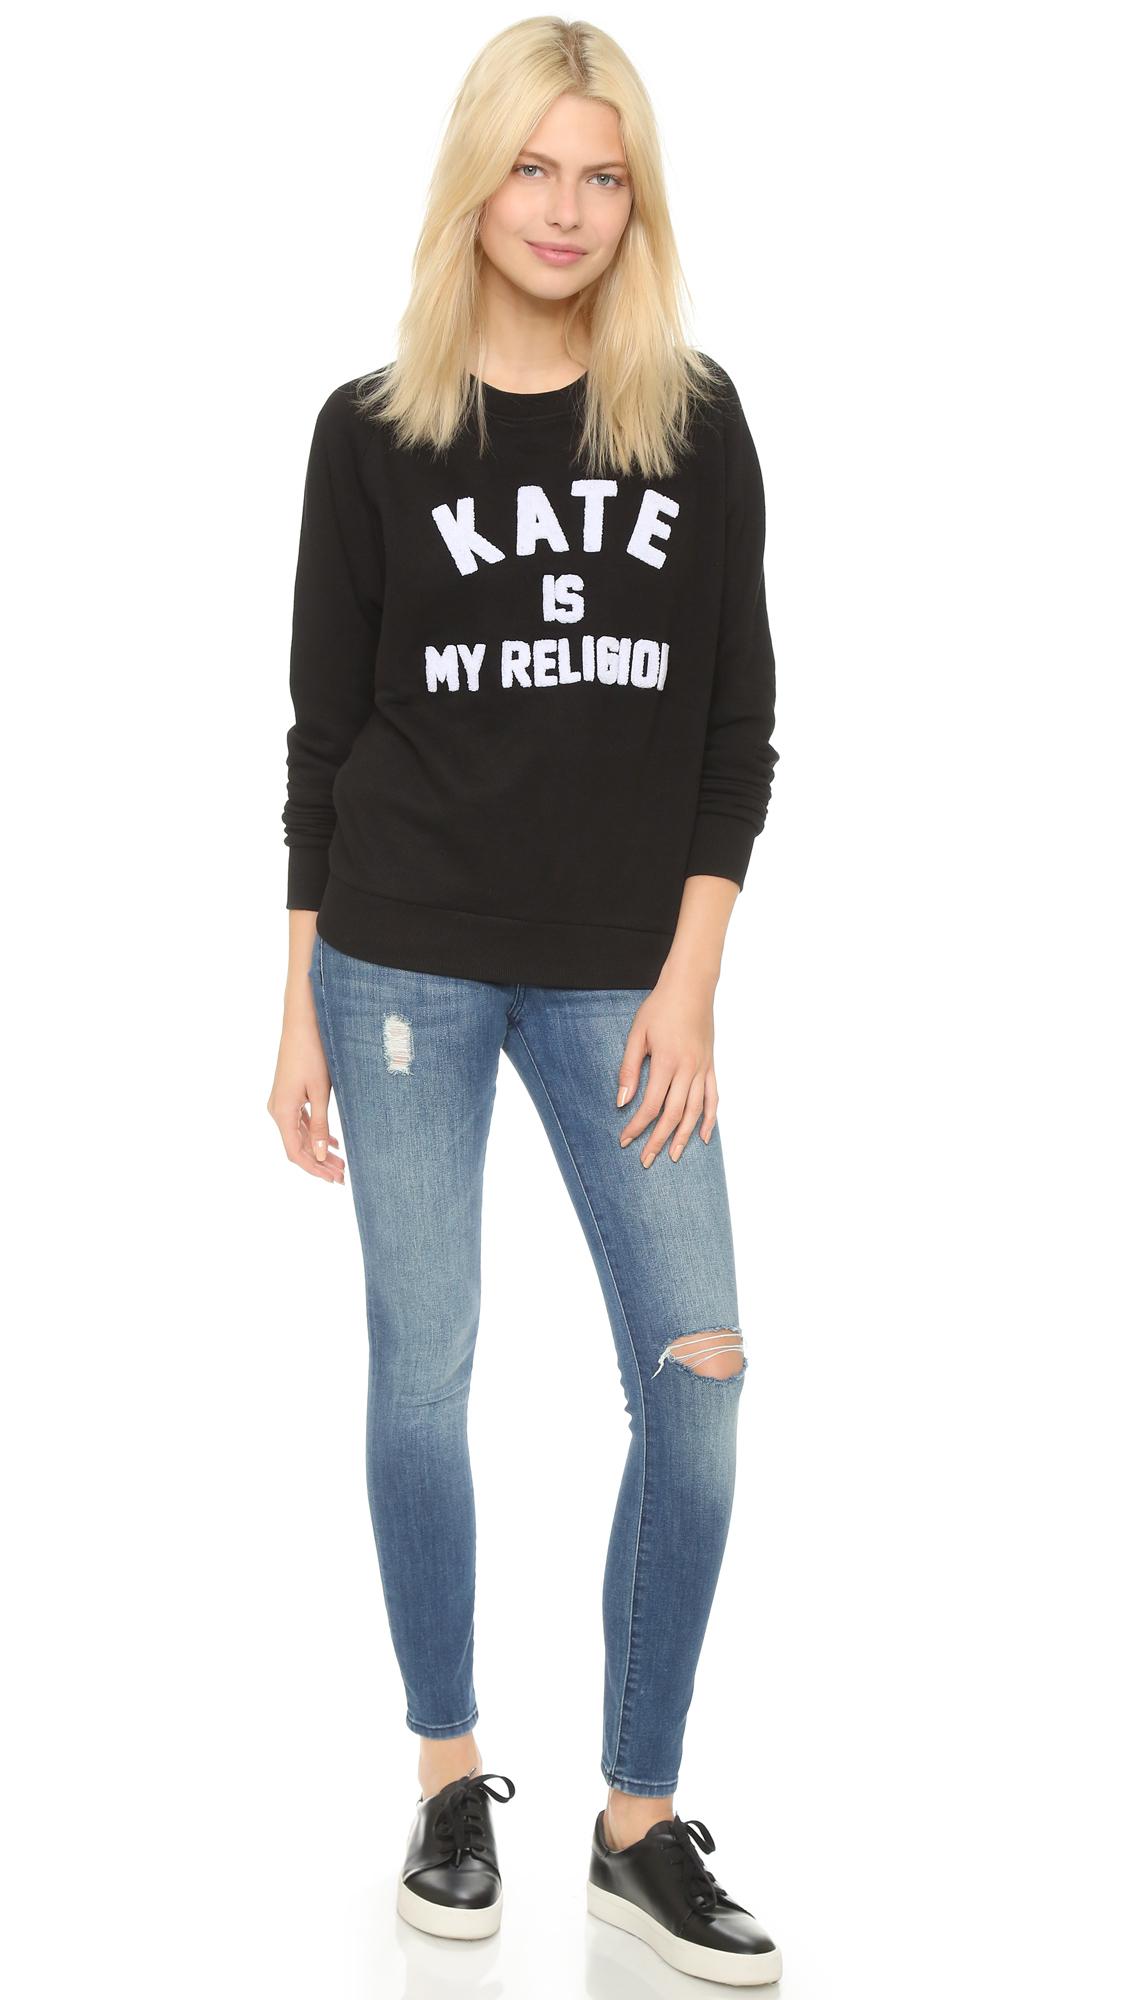 lyst eleven paris kate sweatshirt black in black. Black Bedroom Furniture Sets. Home Design Ideas